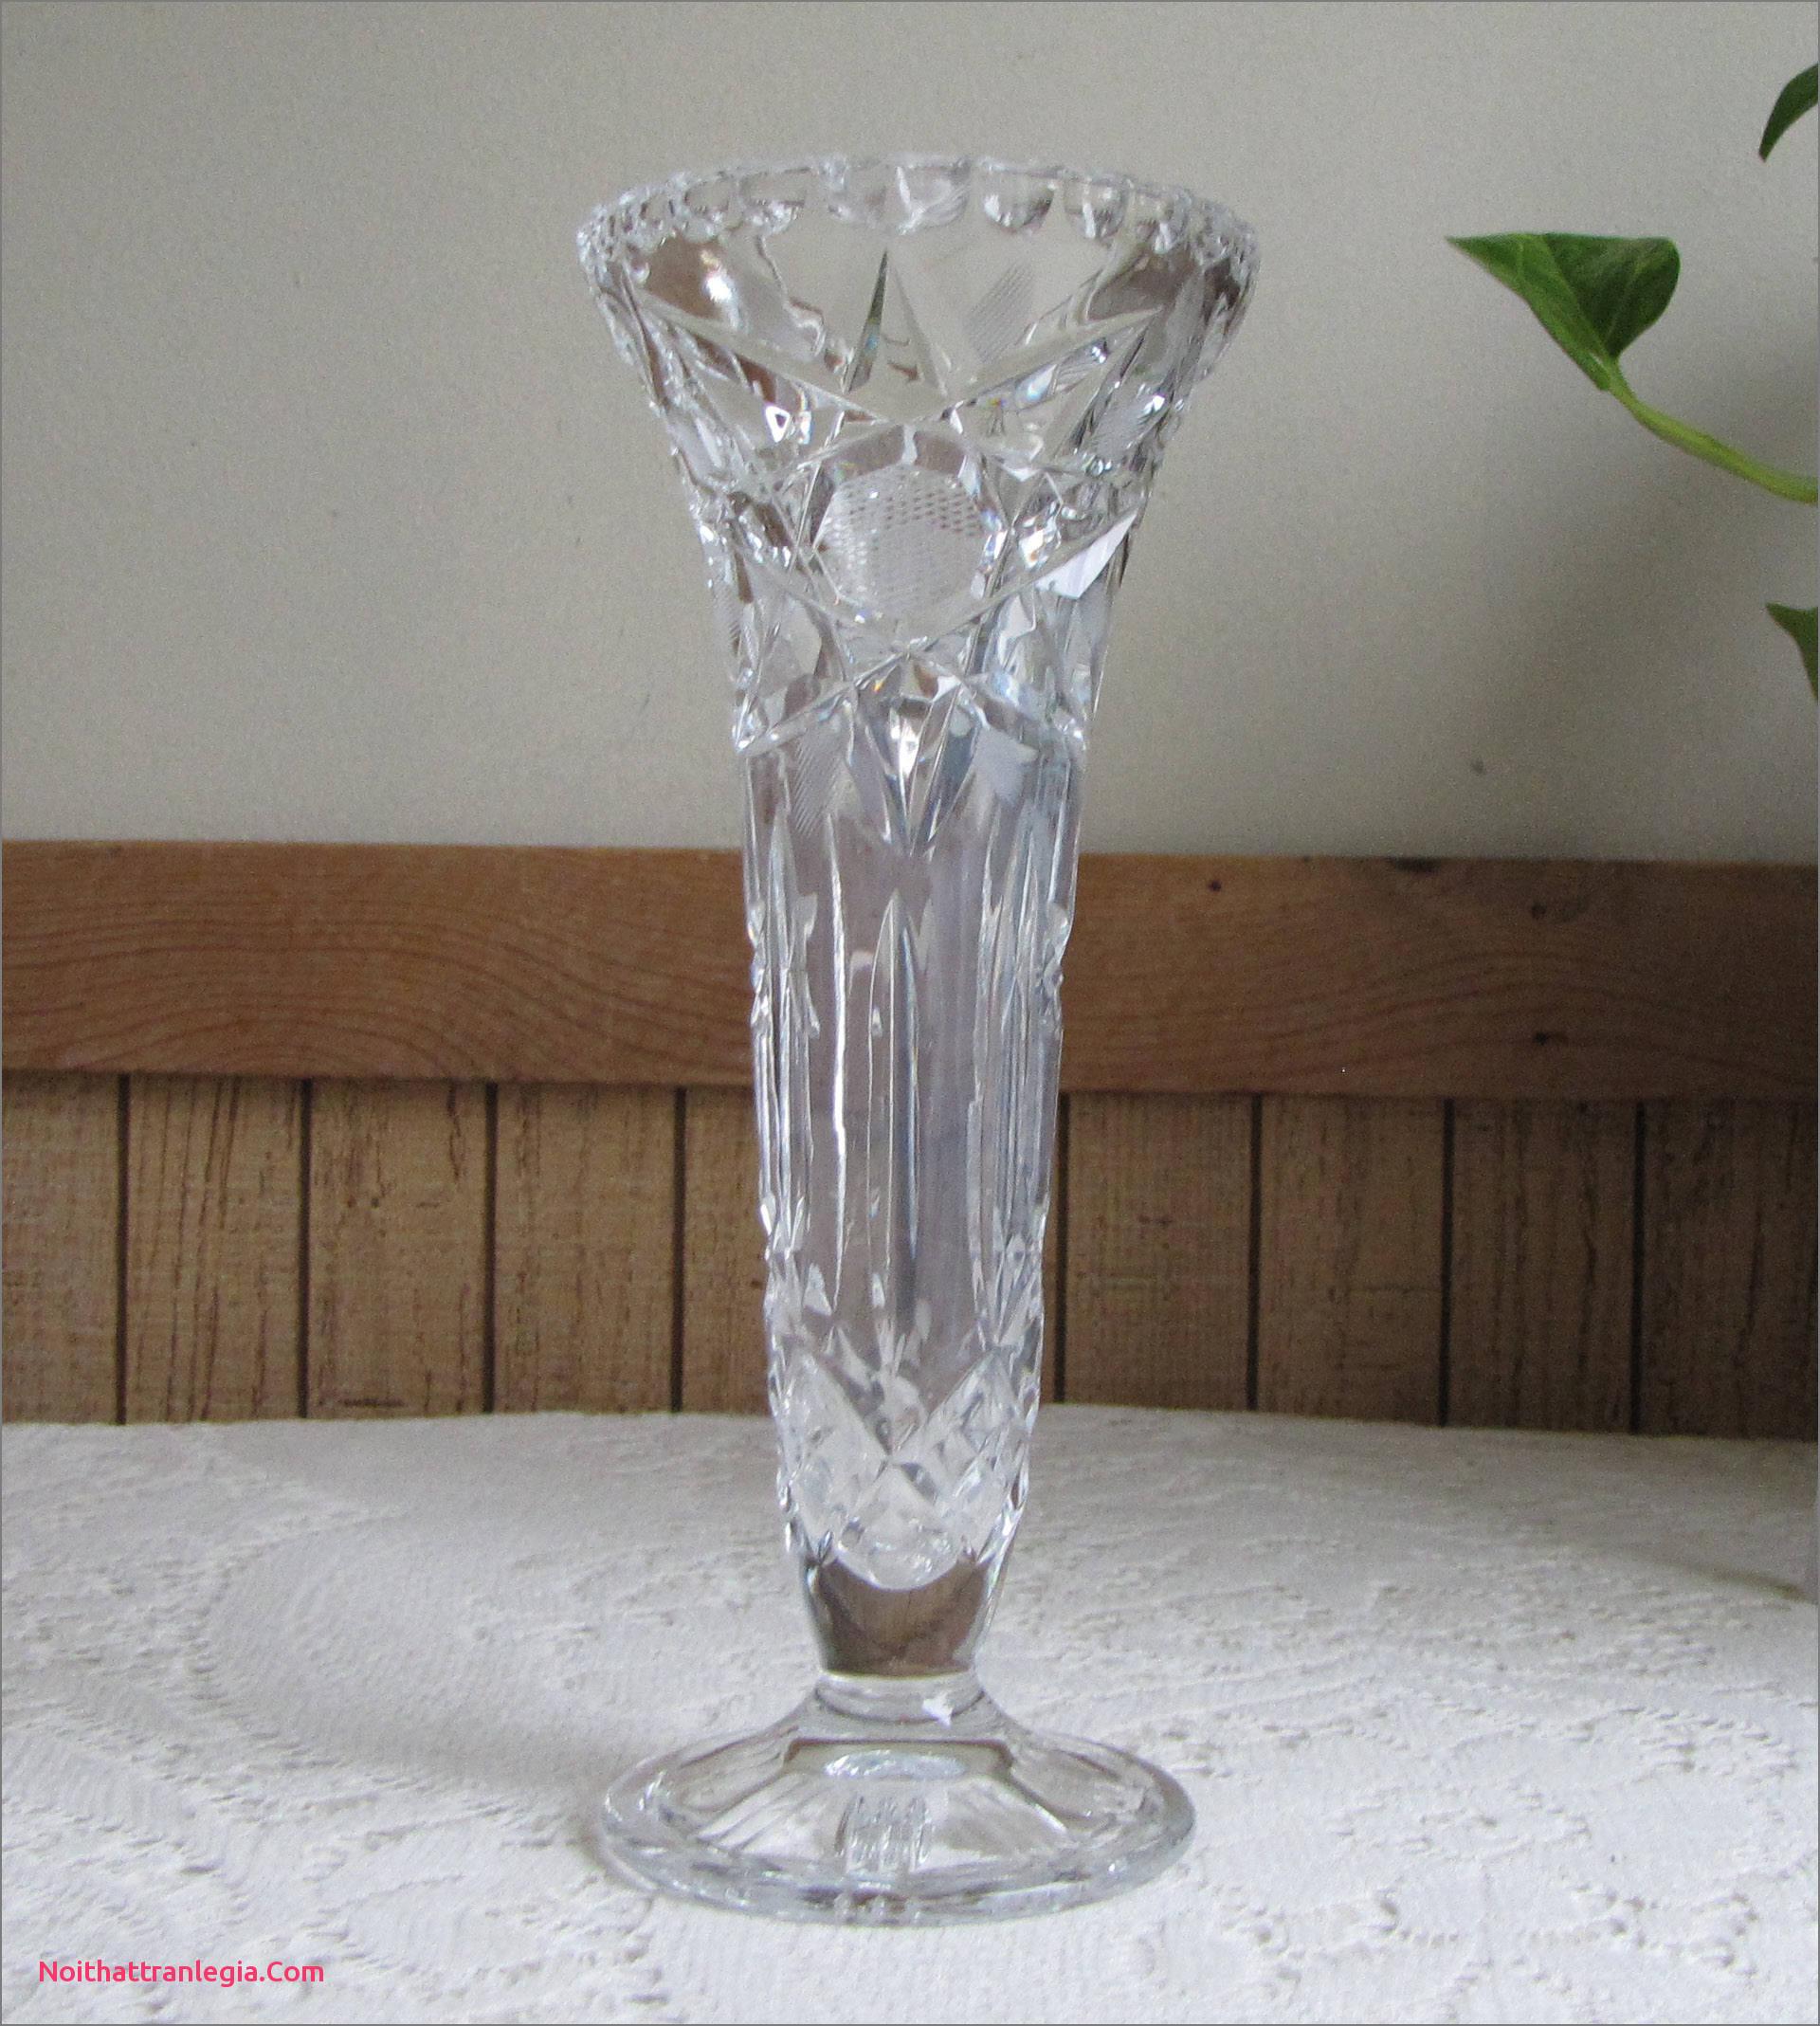 antique blue glass vase of 20 cut glass antique vase noithattranlegia vases design throughout crystal vase cut glass flower vase etched waffle and stars footed vintage vases and florist ware